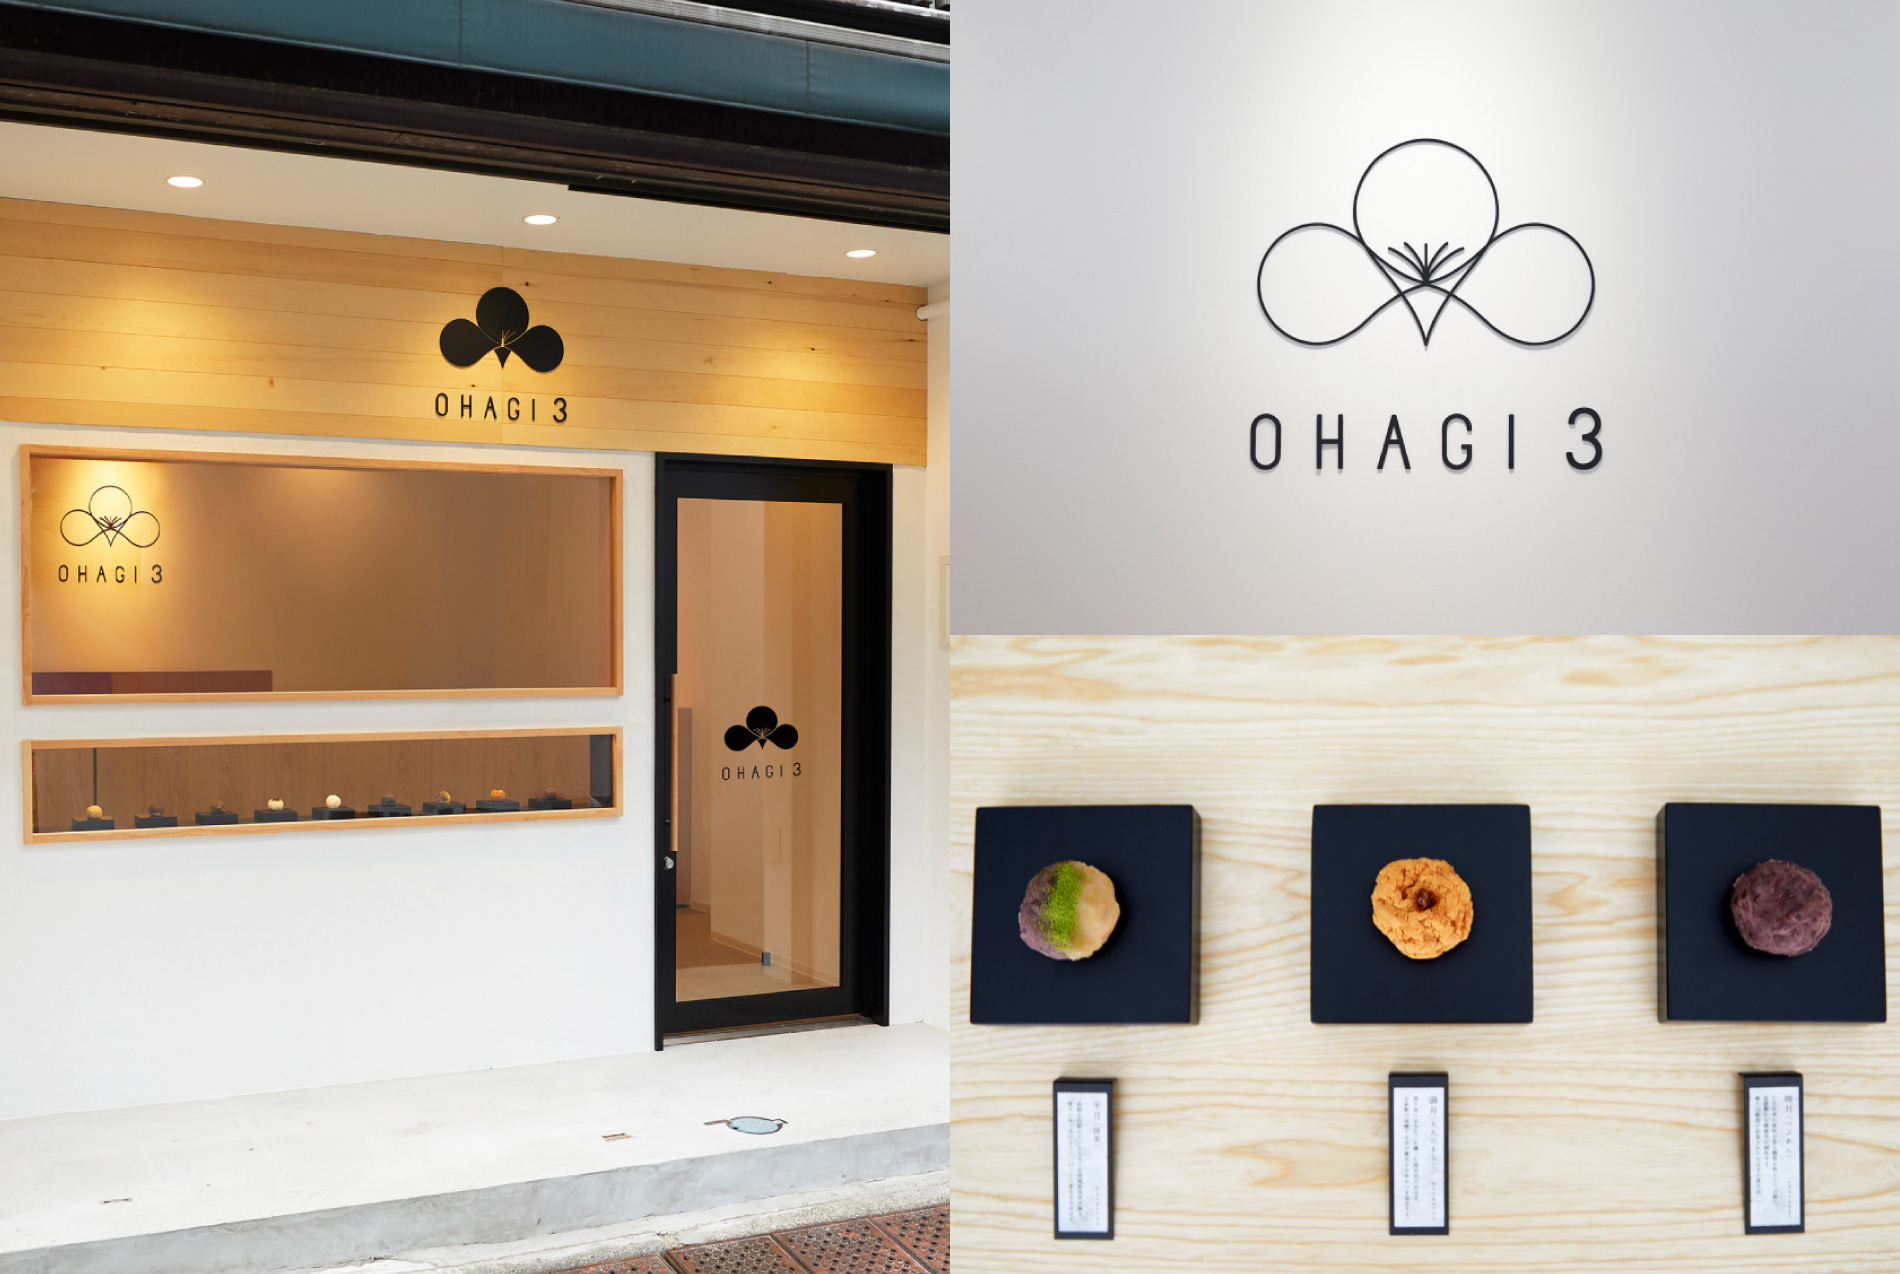 OHAGI3(おはぎさん)浅草店舗